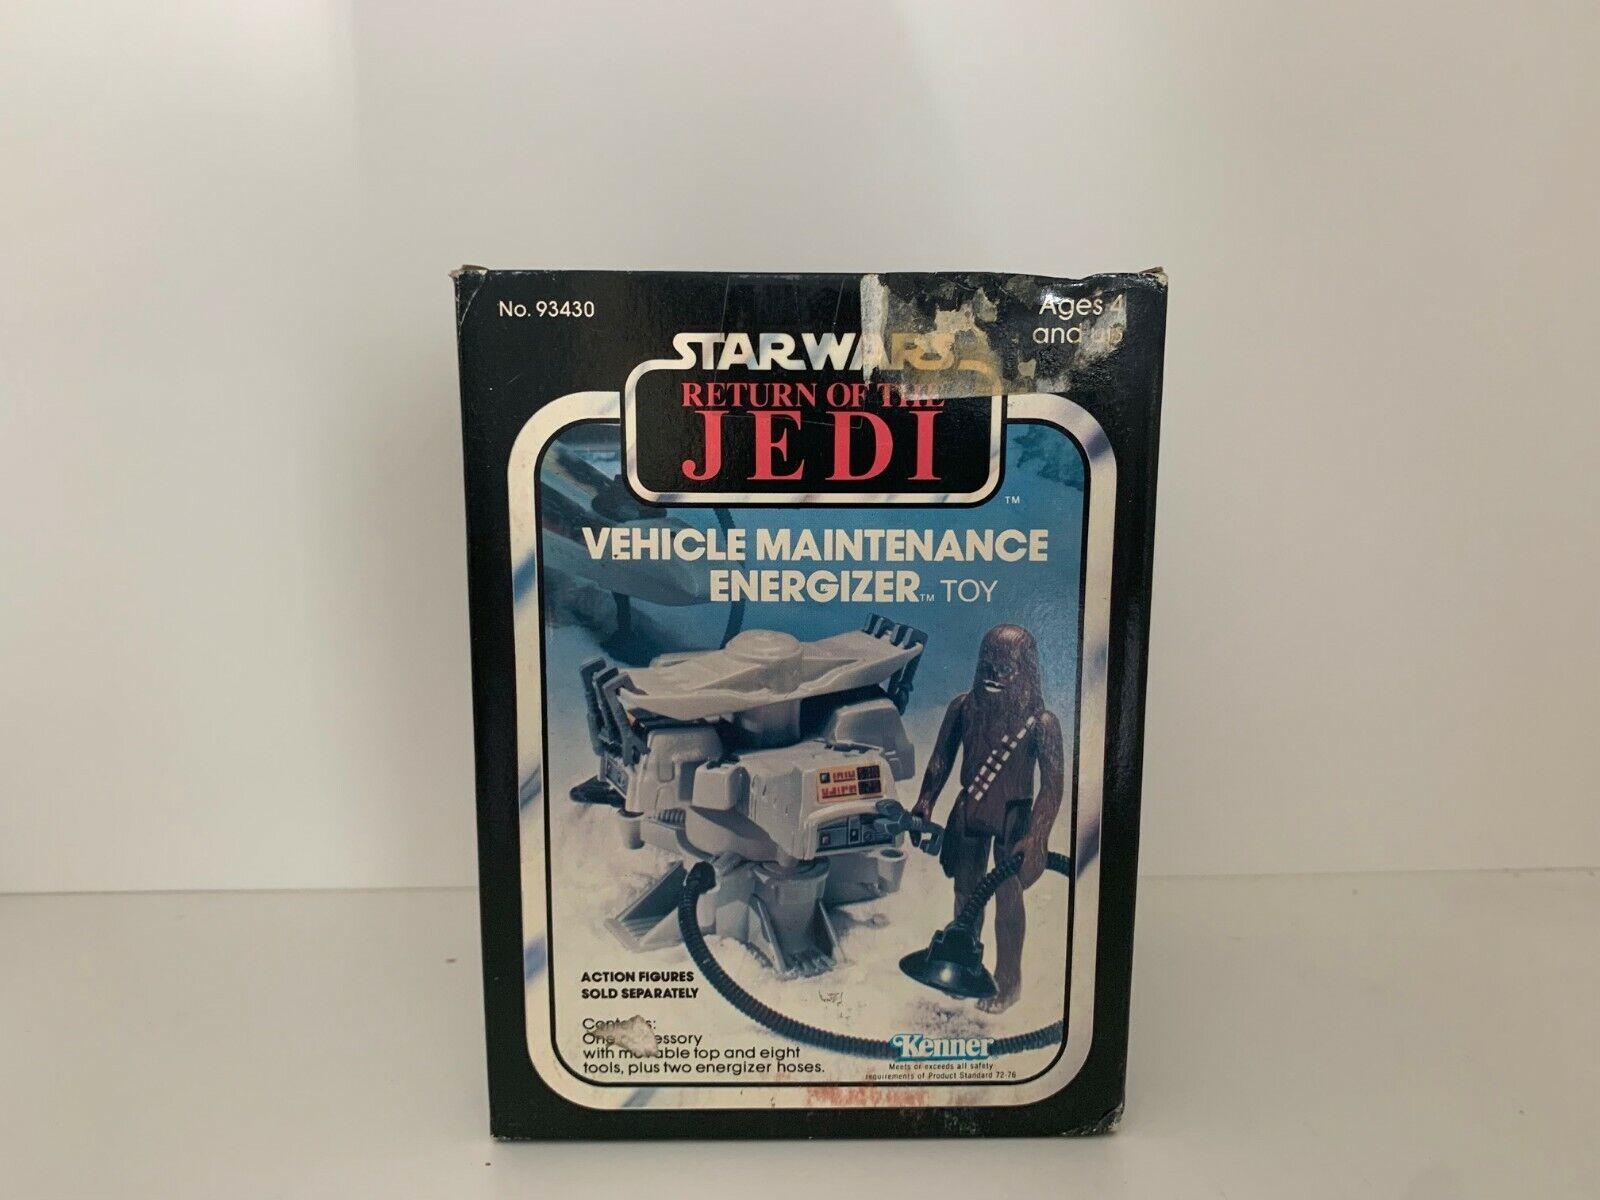 Vintage Star Wars Return Of The Jedi Vehicle Maintenance Energizer - MISB